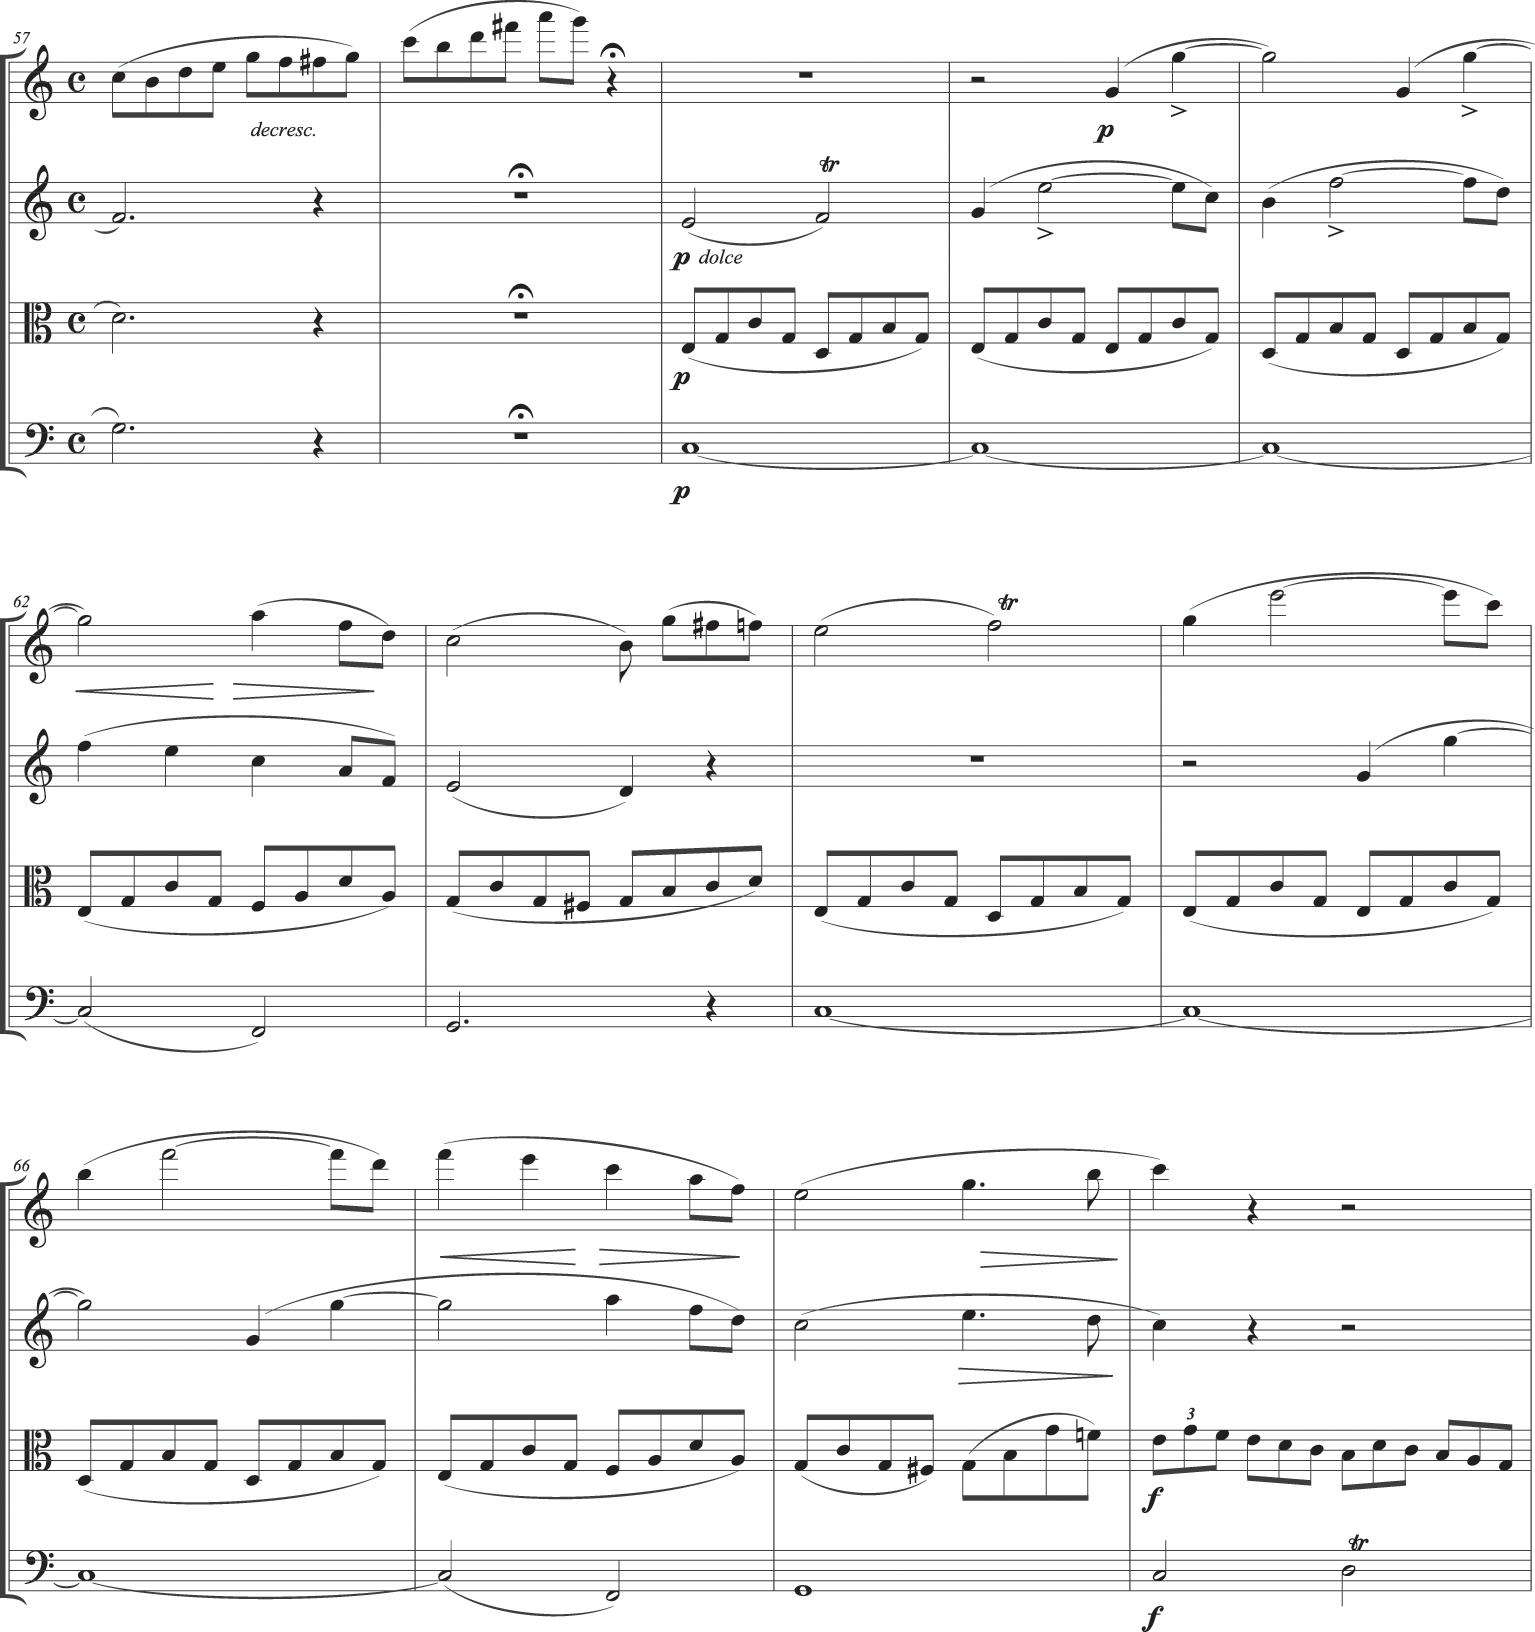 Schubert's first public quartet and sonata form (Chapter 5